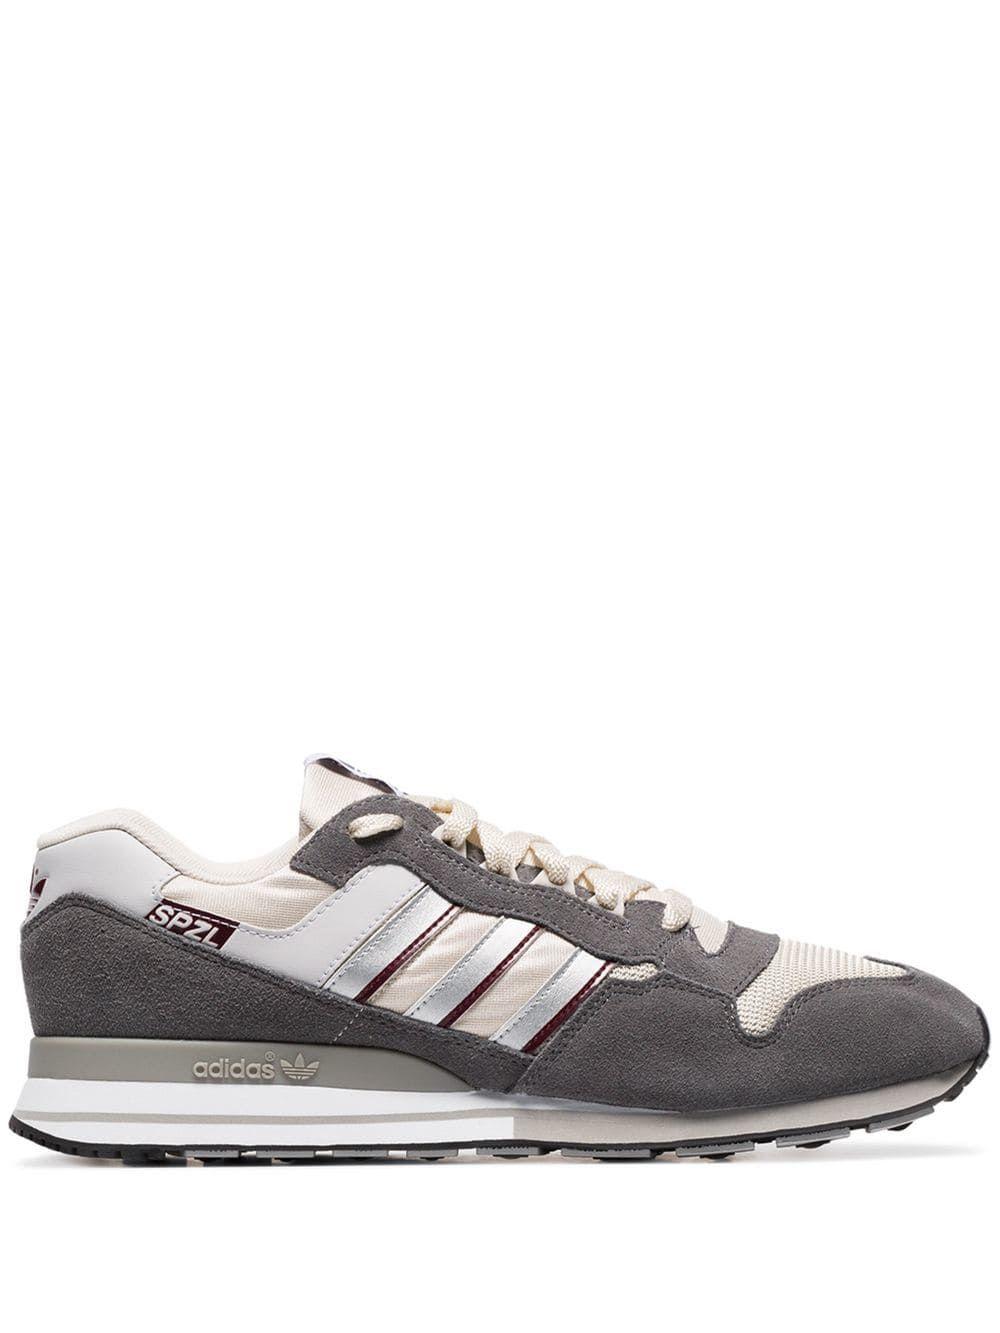 adidas ZX Flux 58 TR Shoe, adidas Originals Schuhe Herren